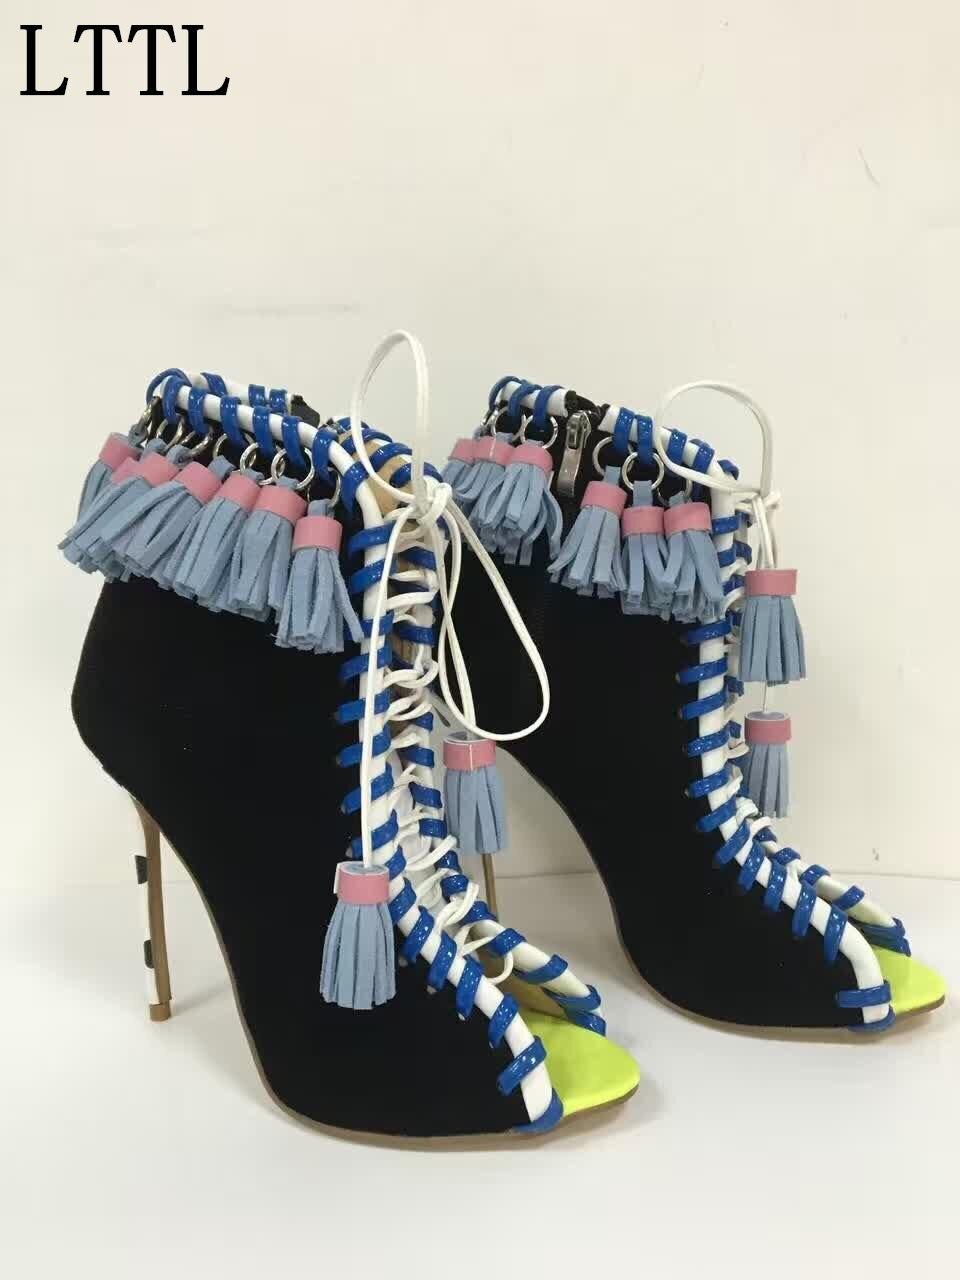 Primavera Outono de Comércio exterior de Couro Genuíno Lace-up Tassel escavar Sapatos Boca de Peixe de Alta-salto alto Mulheres Tornozelo botas